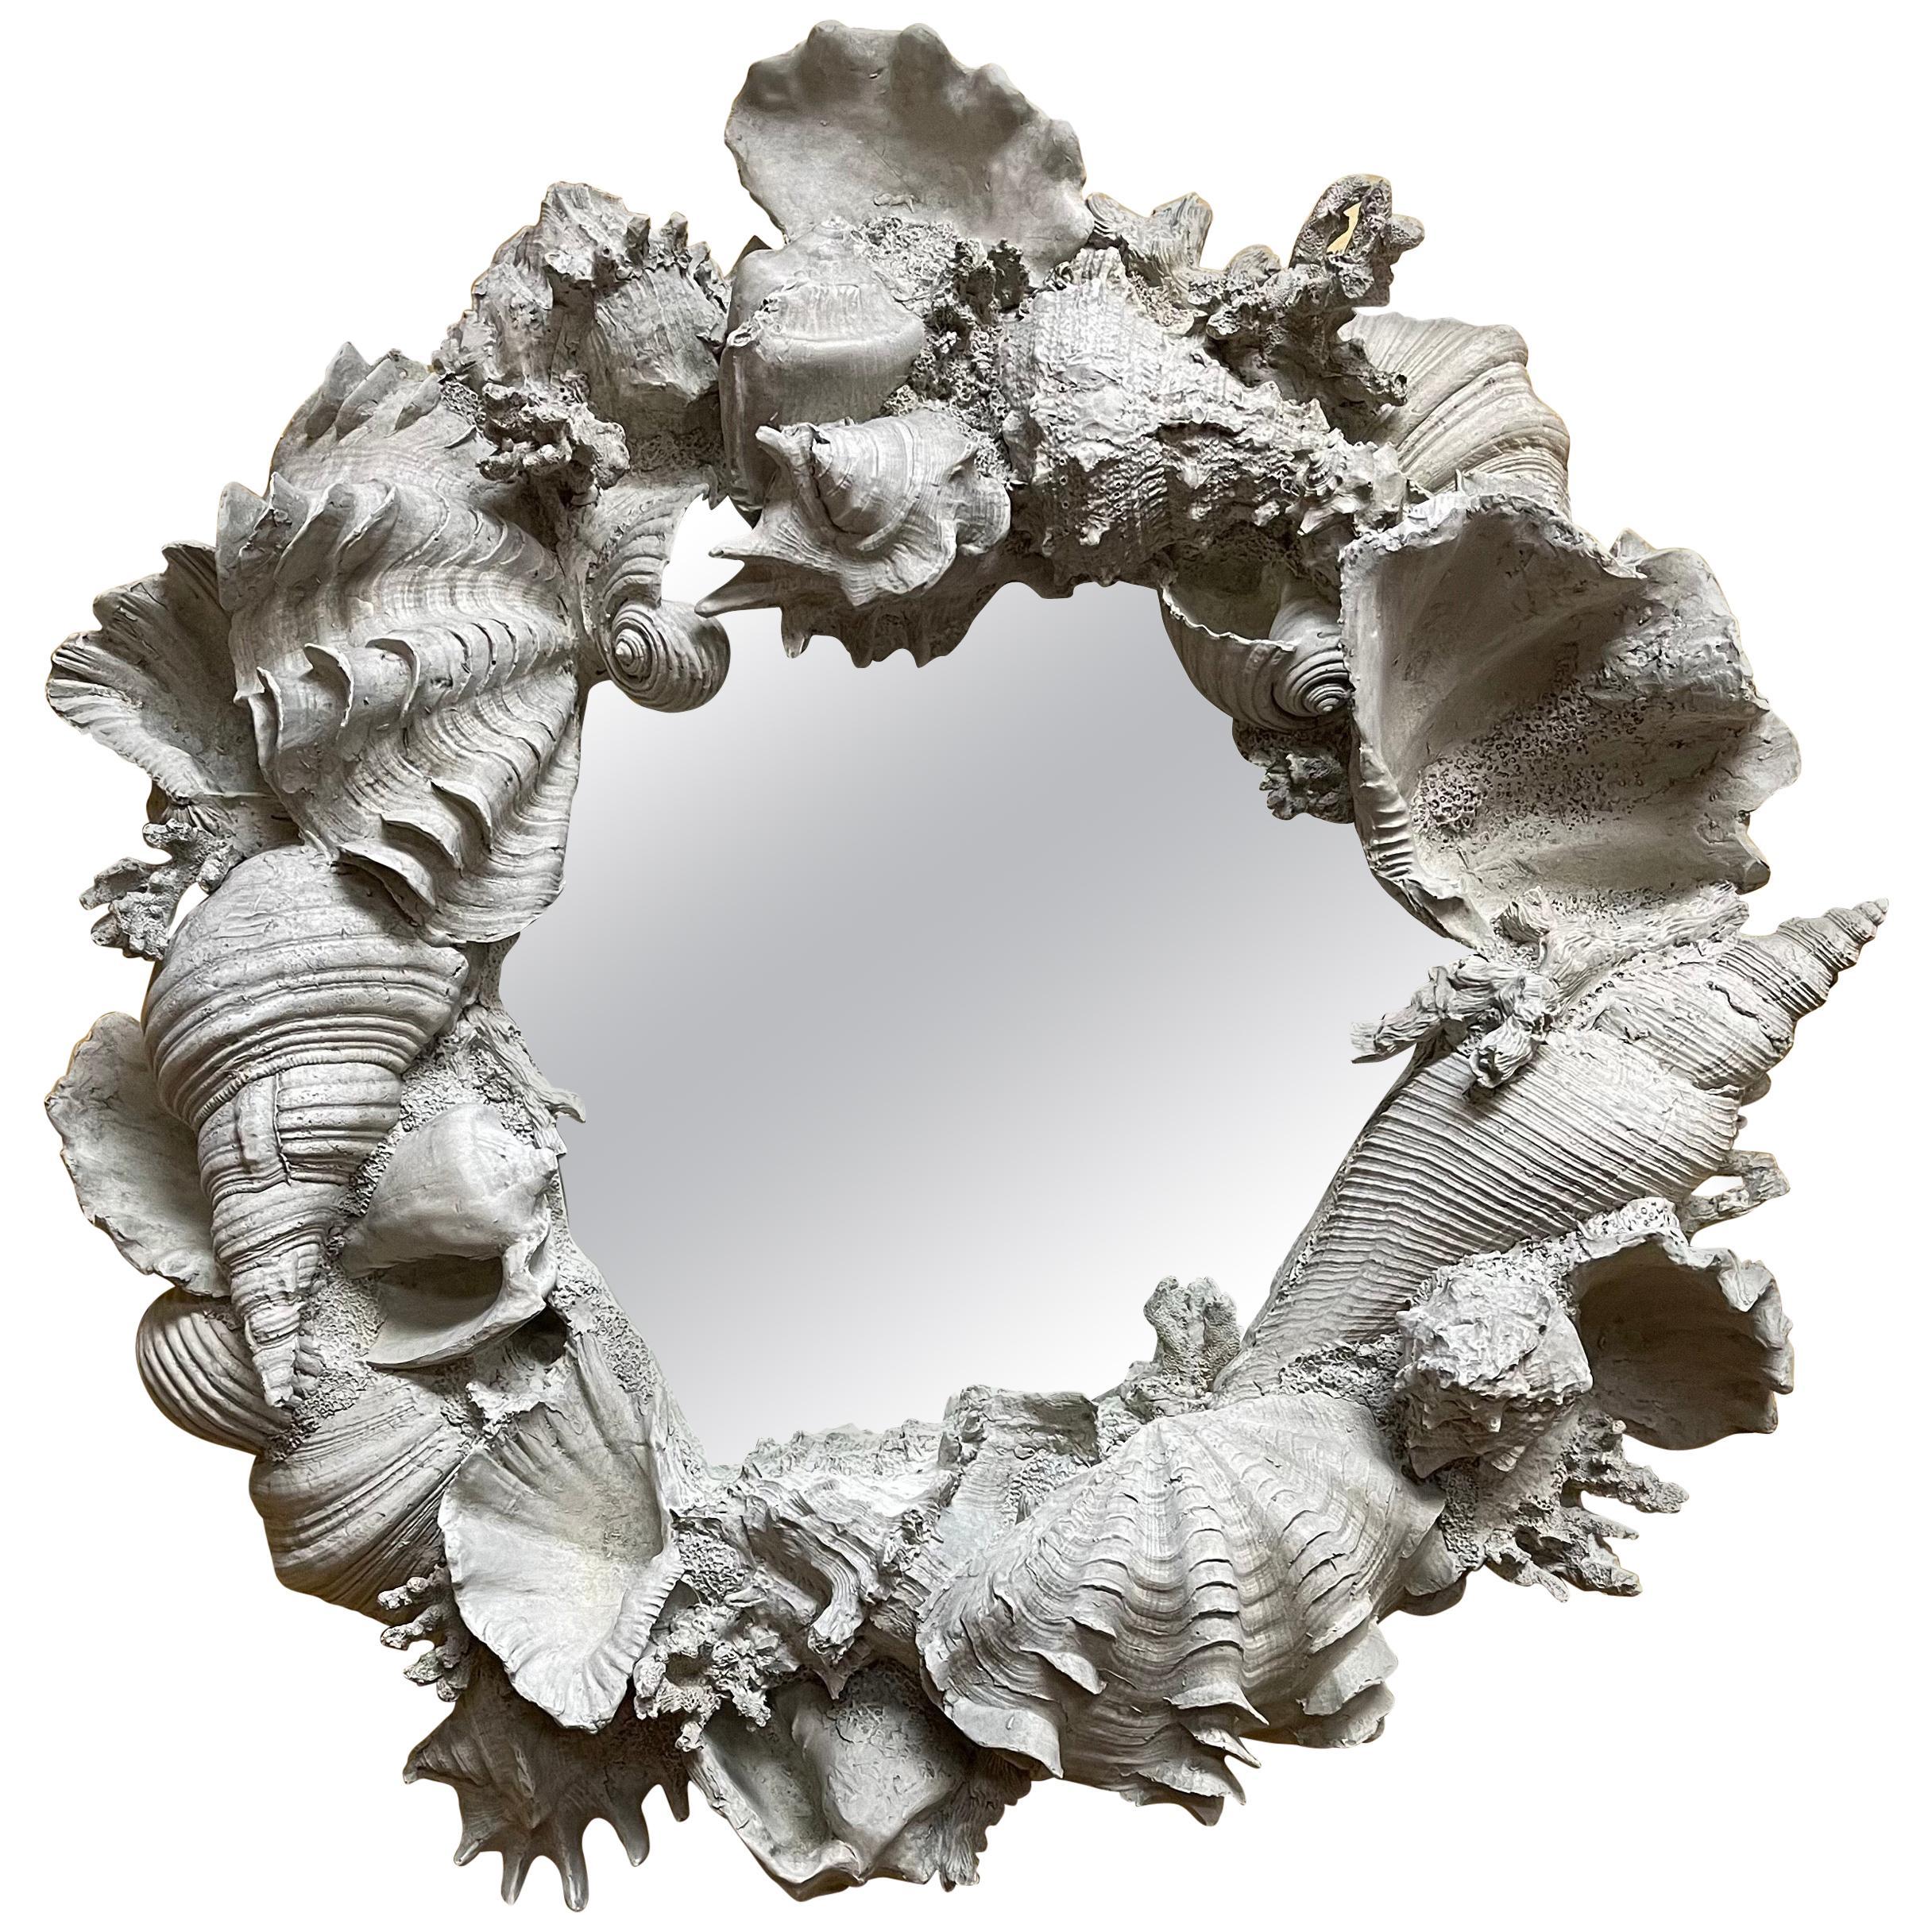 Faux Seashell Encrusted Mirror in Molded Fiberglass